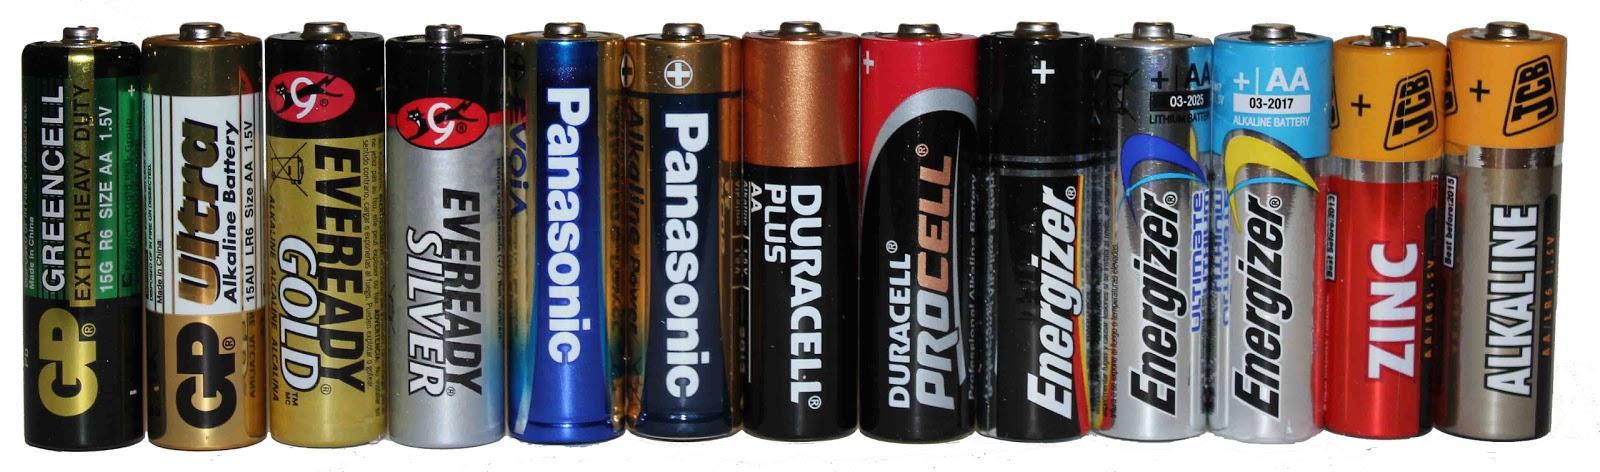 Scavenger S Blog Q 1 Non Rechargeable Batteries Why Do